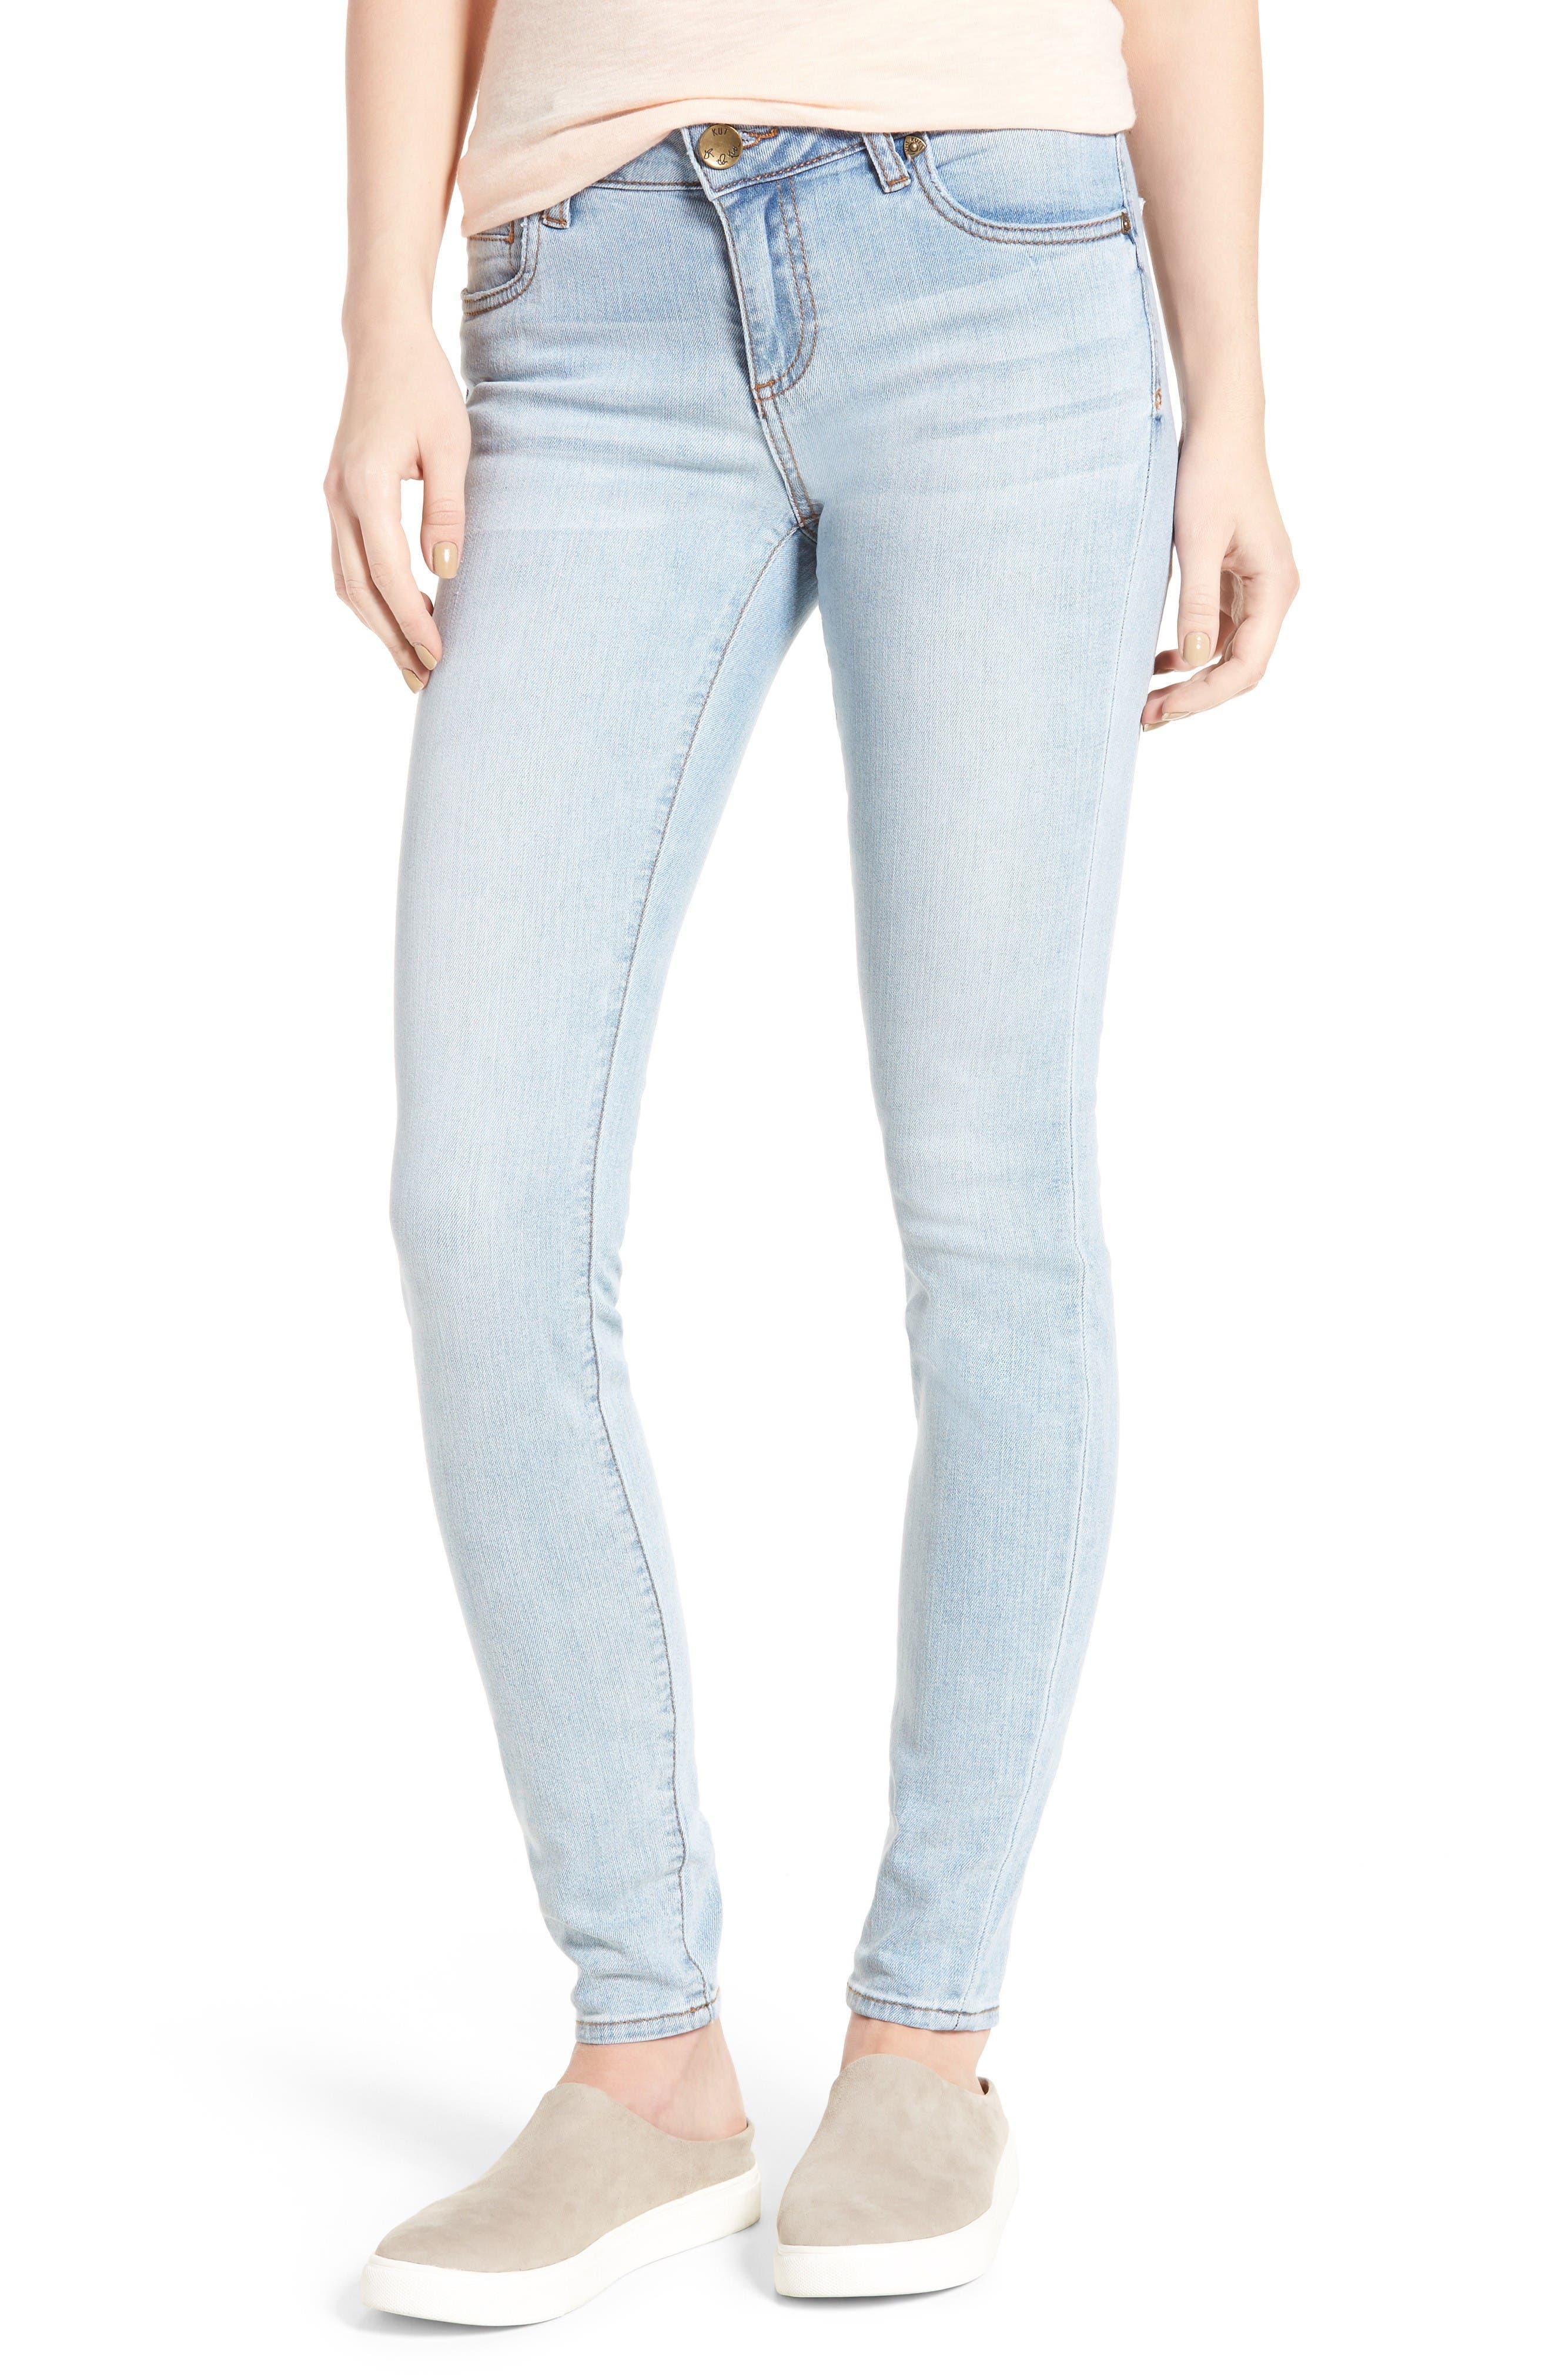 Main Image - KUT from the Kloth Mia Toothpick Skinny Jeans (Expectation)